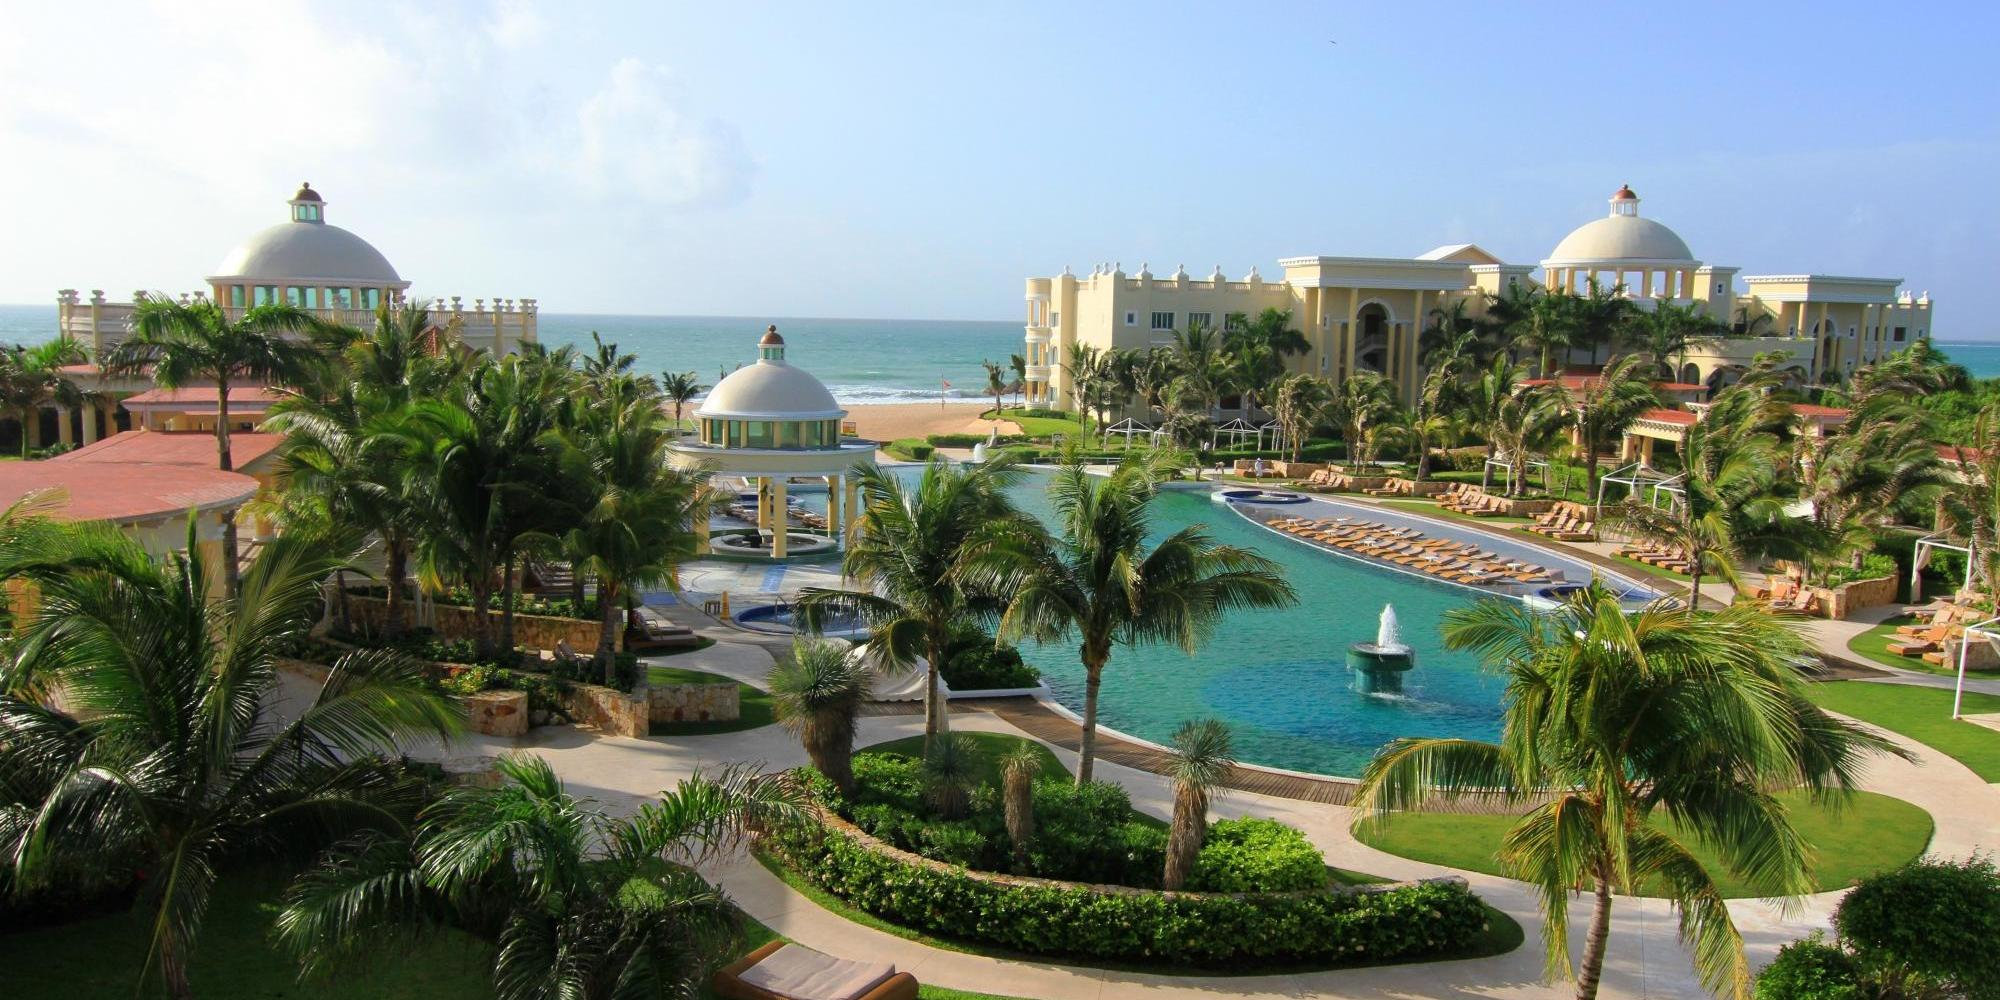 10 Best AllInclusive Resorts According To TripAdvisors